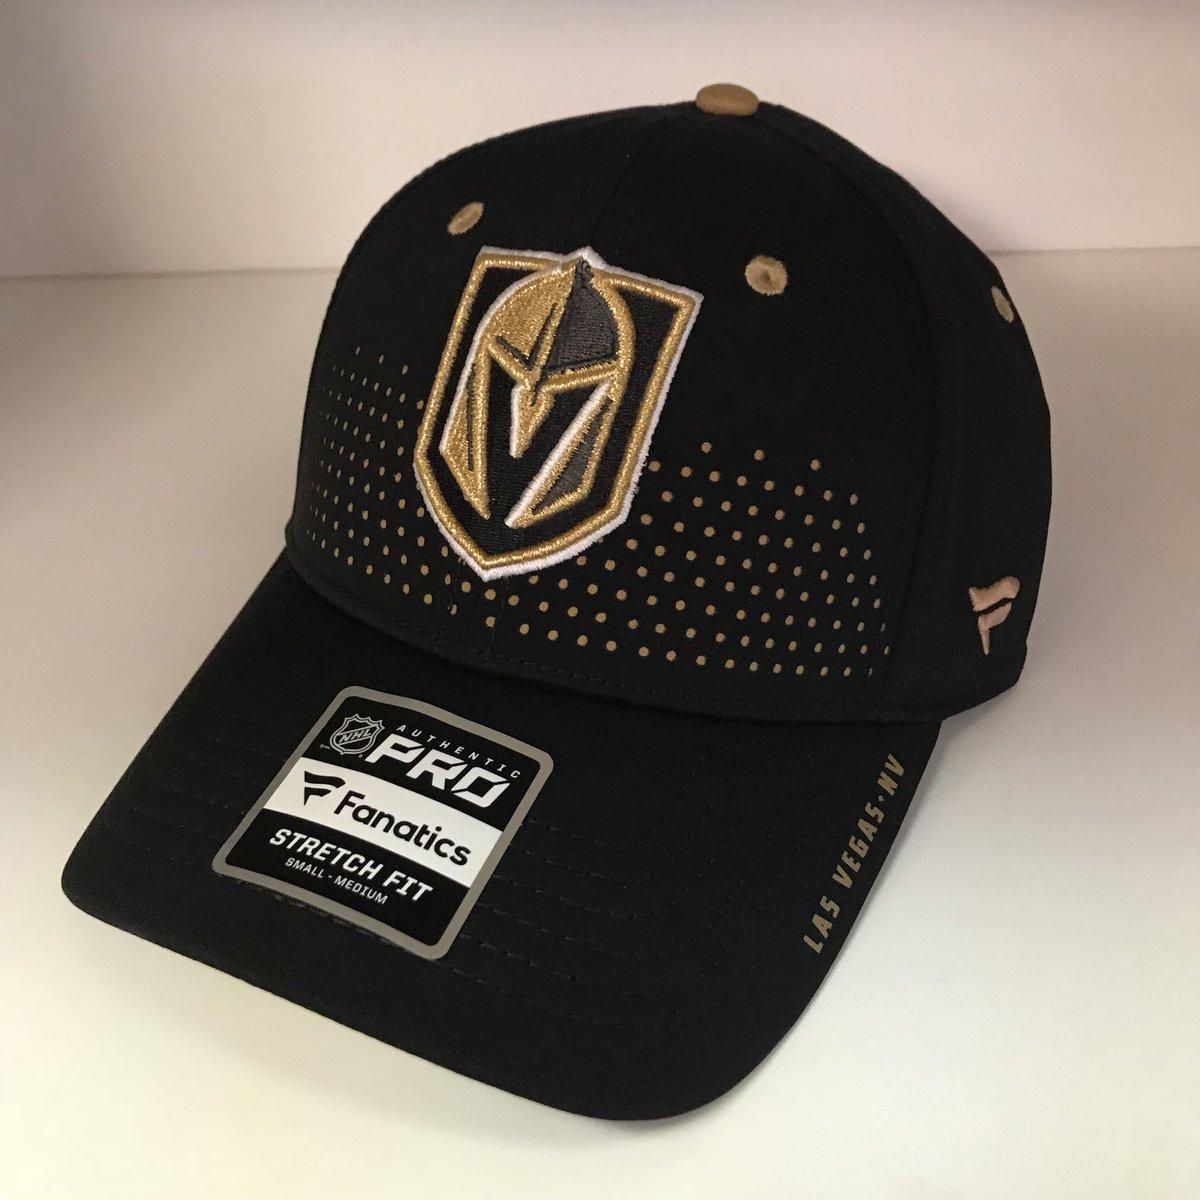 2018 NHL Draft Hats Are Here! - HockeyJerseyConcepts 4cfc86f8c69